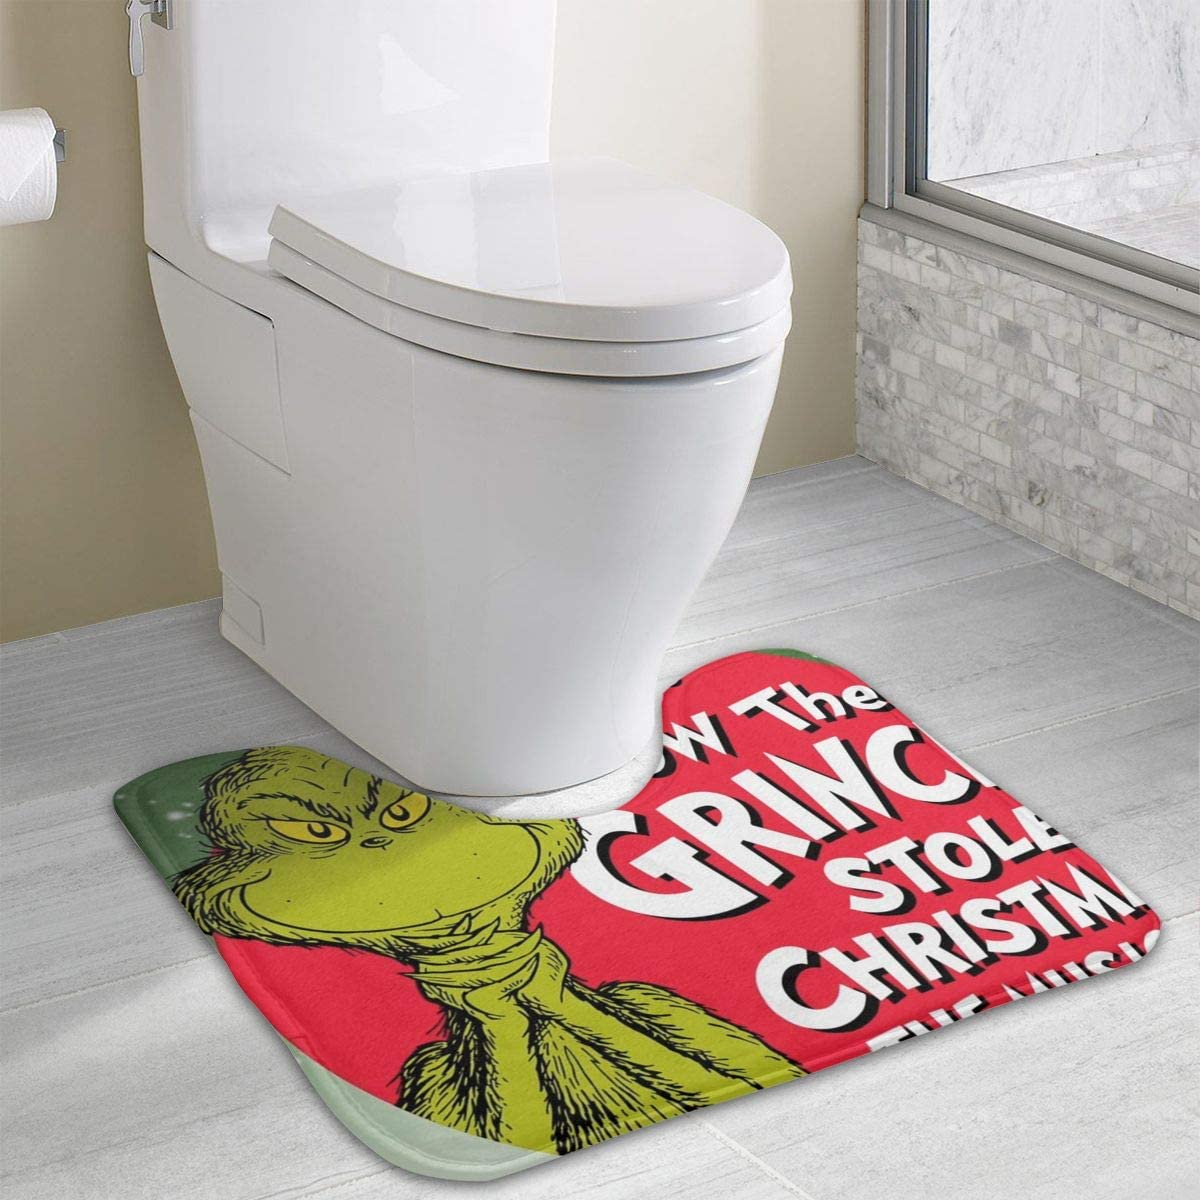 BDFBD Grinch Stole tapete de baño de Navidad – 19